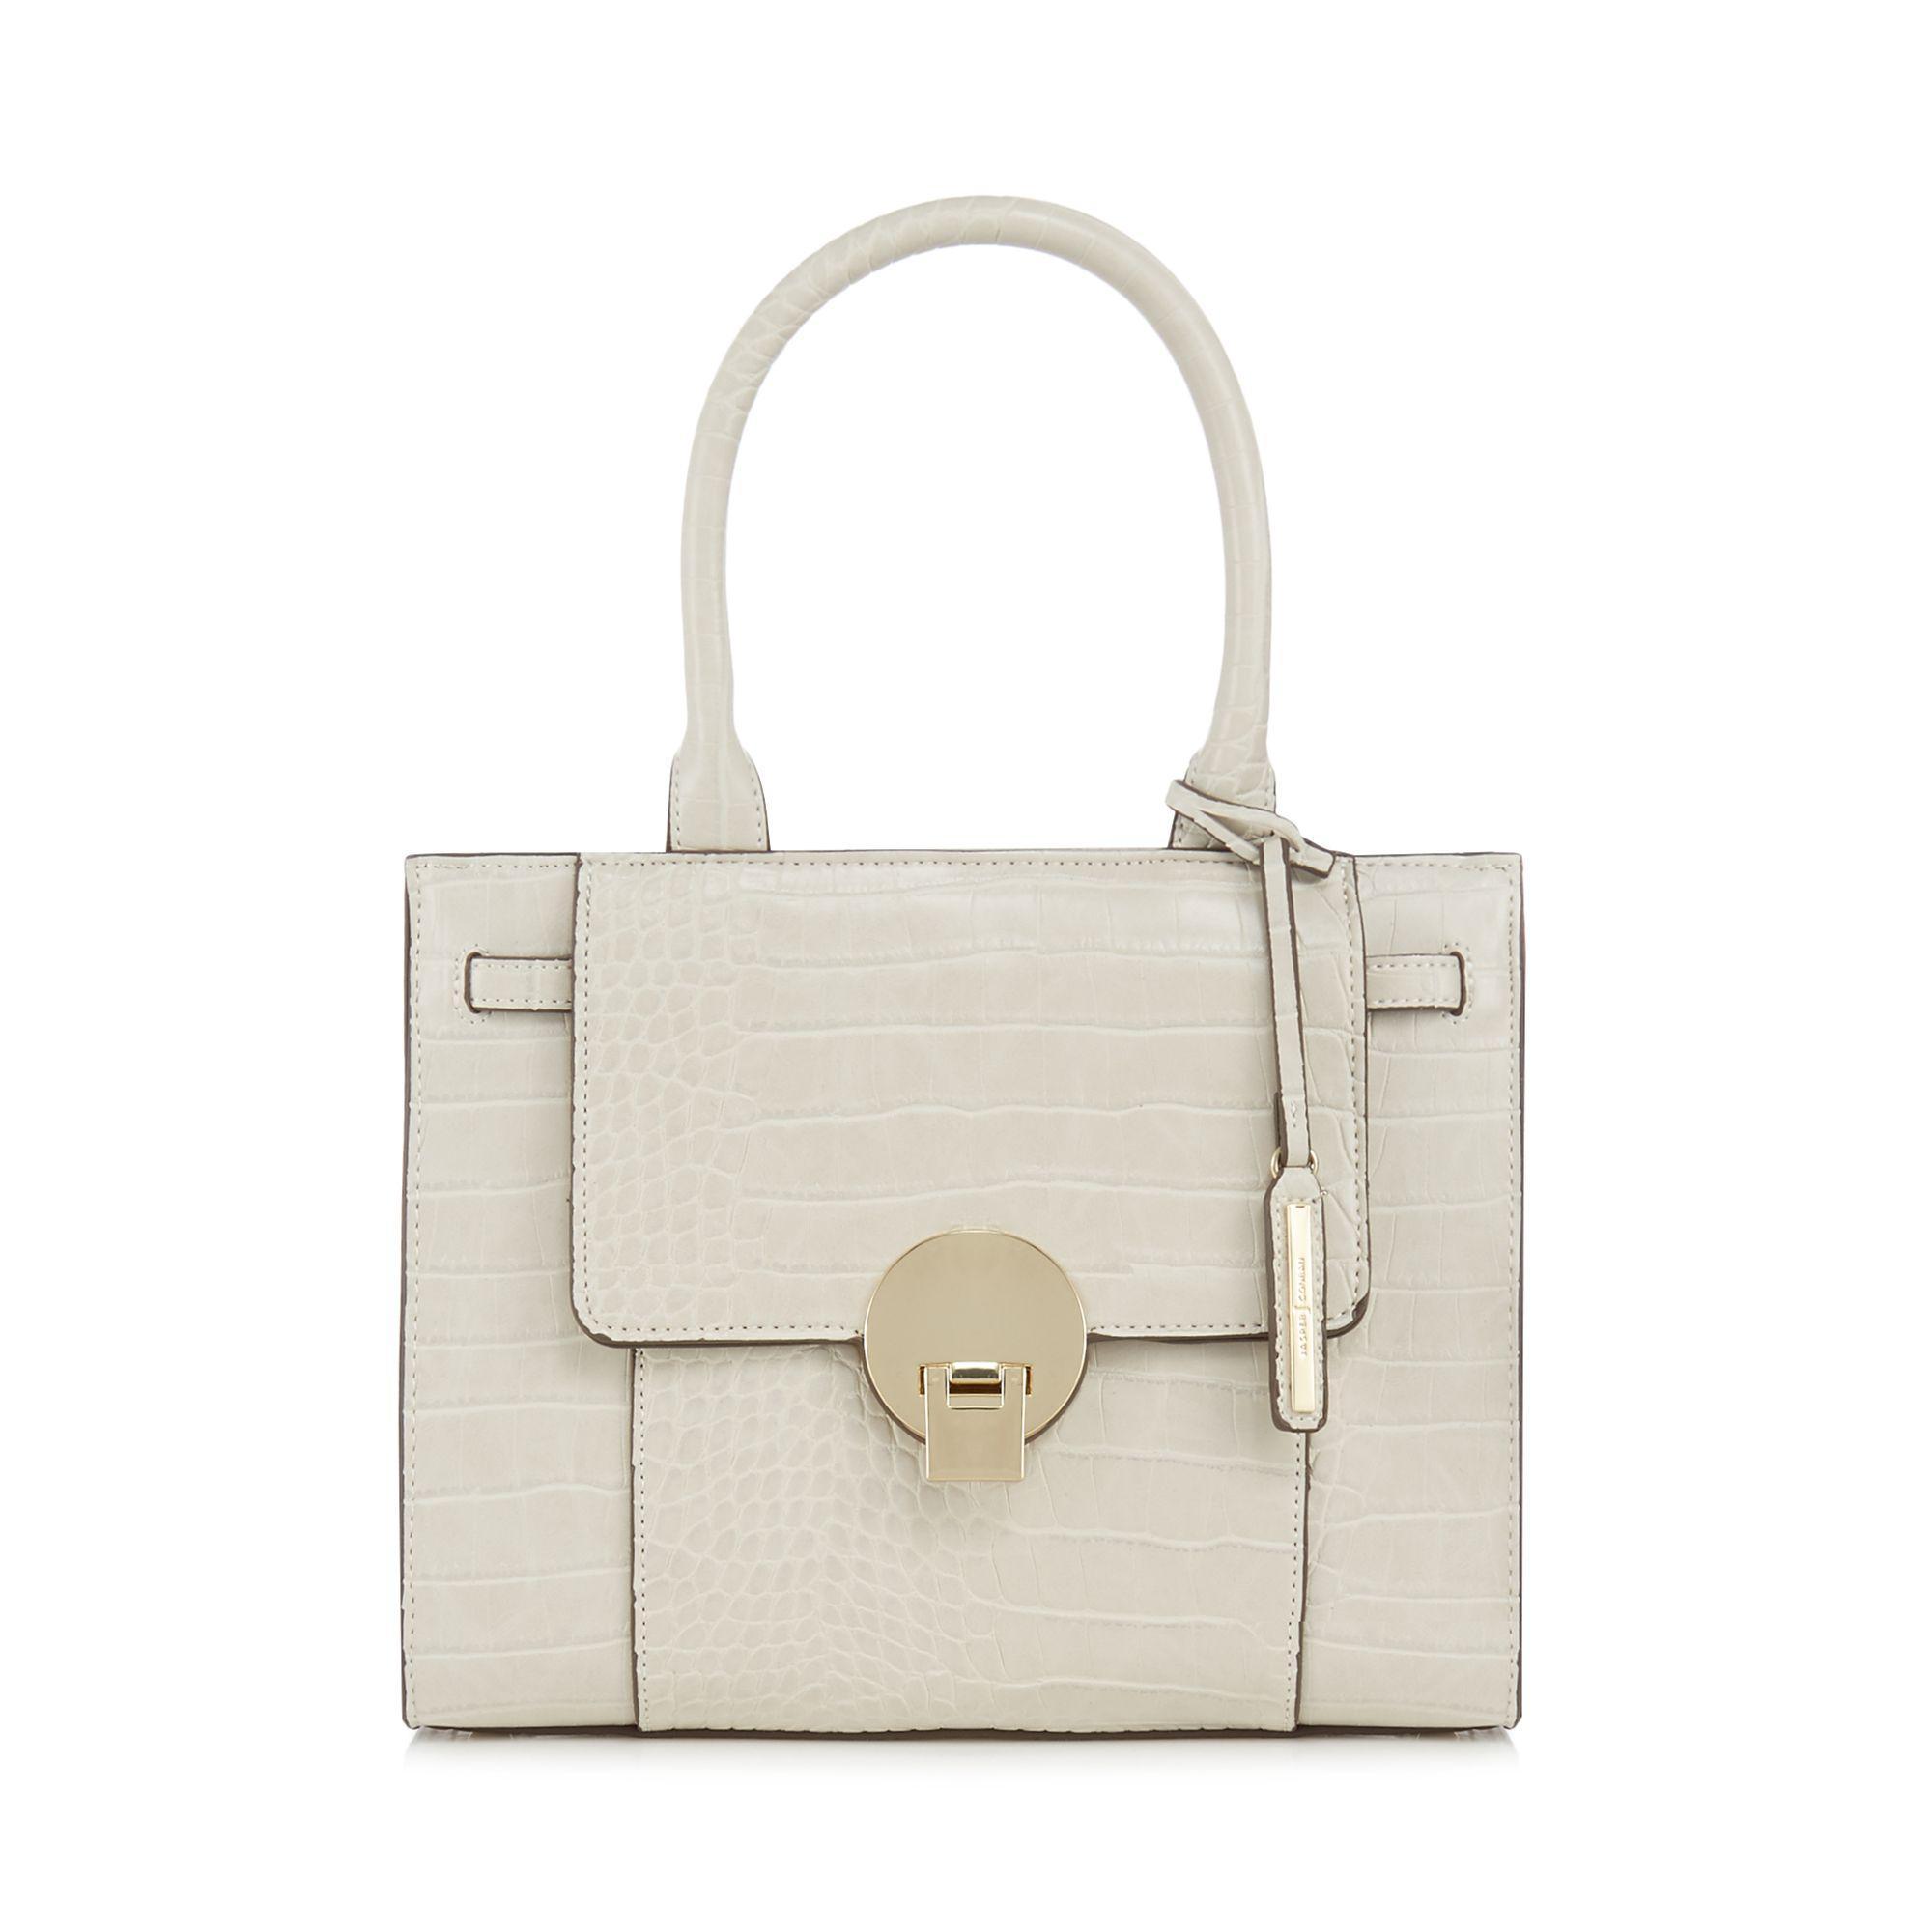 8c08647129de J By Jasper Conran Cream Croc Effect  knightsbridge  Small Grab Bag ...